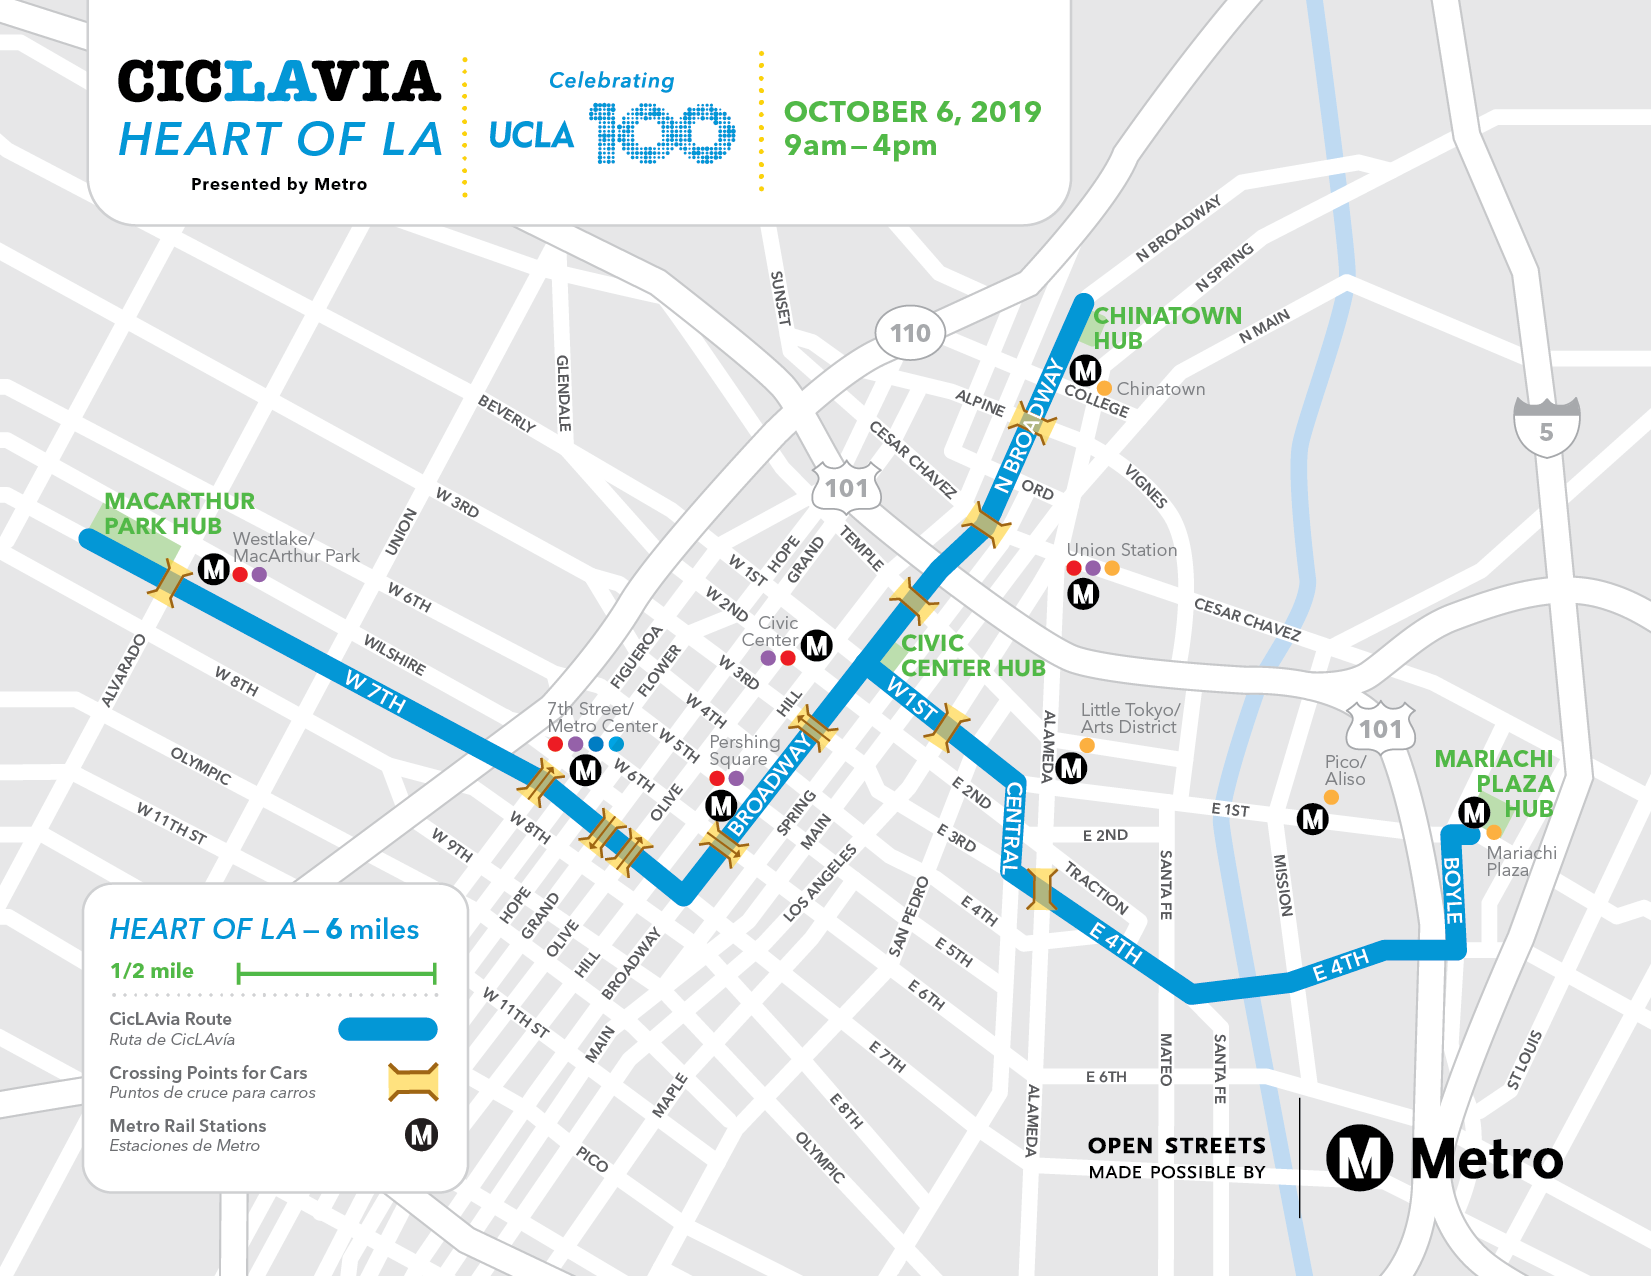 CicLAvia— of LA - CicLAvia on culver city bus map, los angeles bus map, ucla parking map, union station bus map, santa monica bus map, ucla ackerman union map,